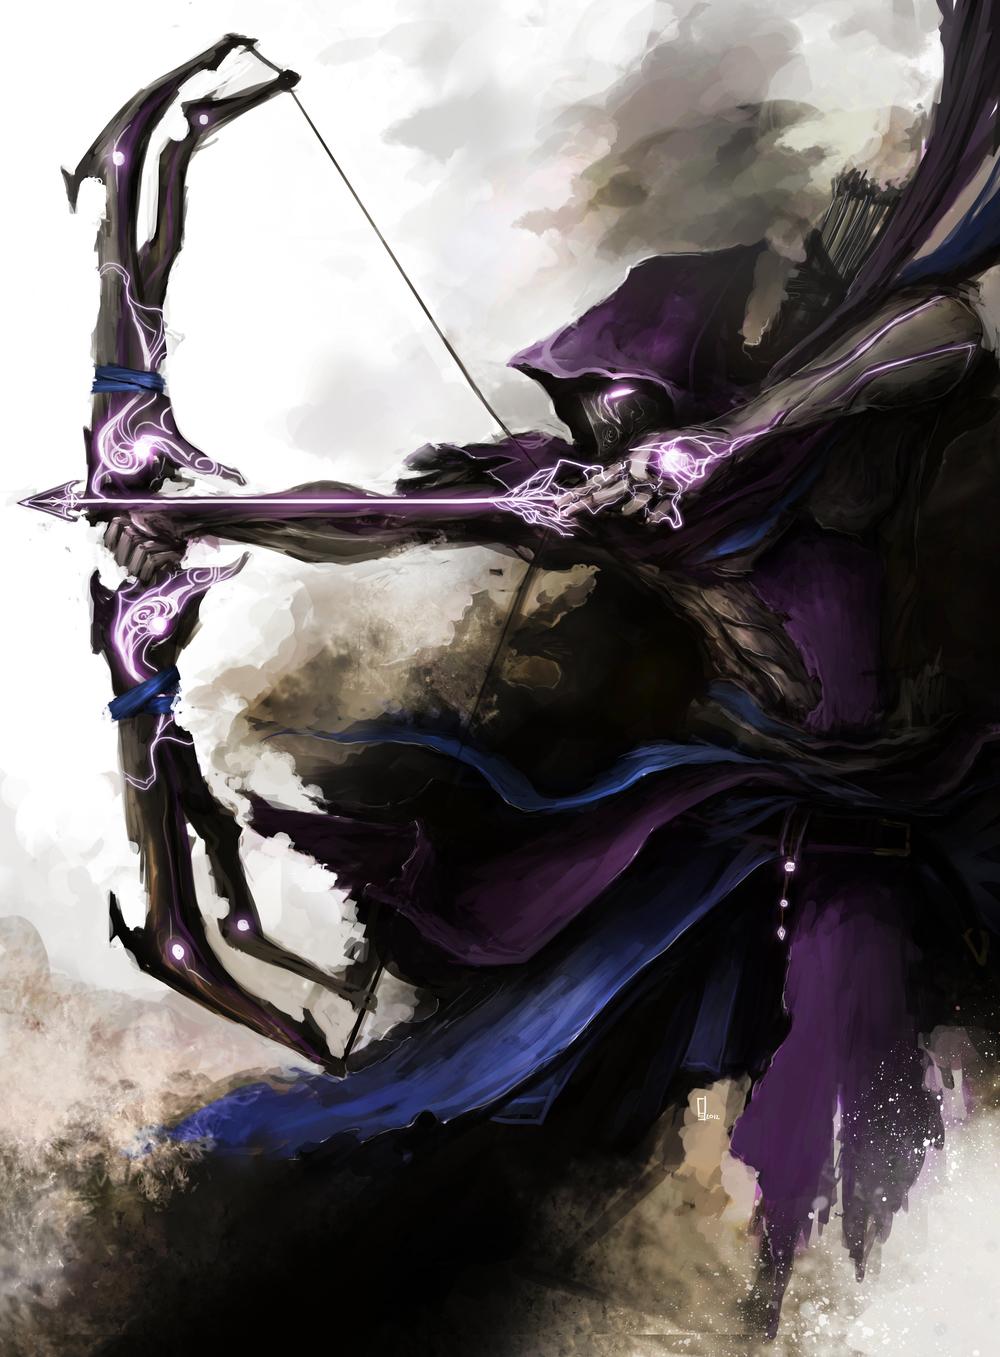 the_avengers___hawkeye_by_thedurrrrian-d54jiwr.jpg